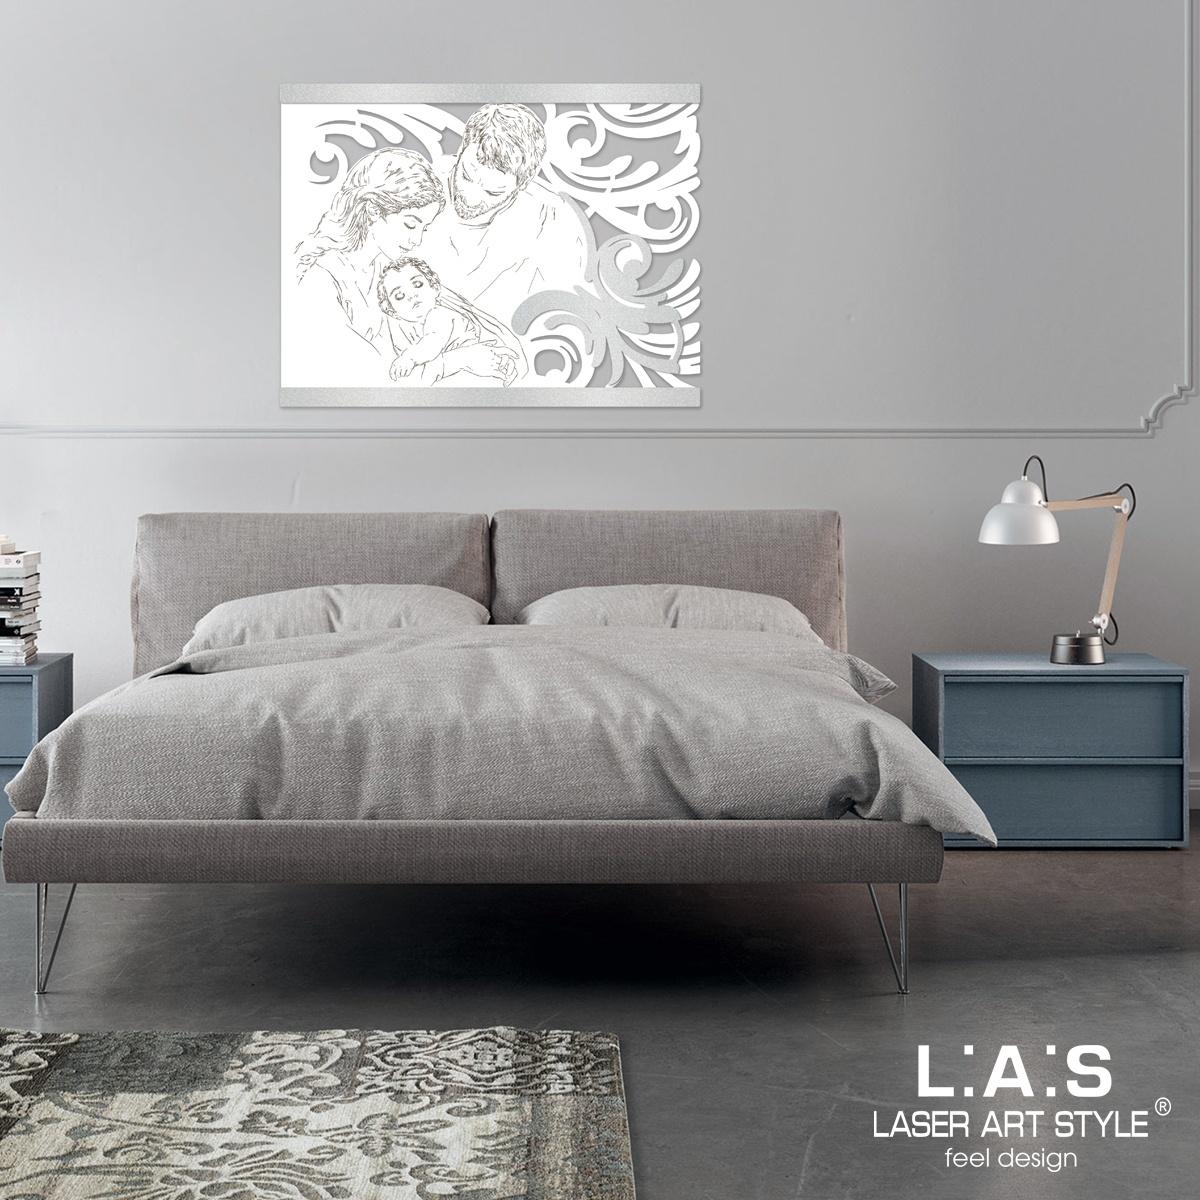 L:A:S - Laser Art Style - CAPOLETTO SACRA FAMIGLIA SI-327XL BIANCO-ARGENTO